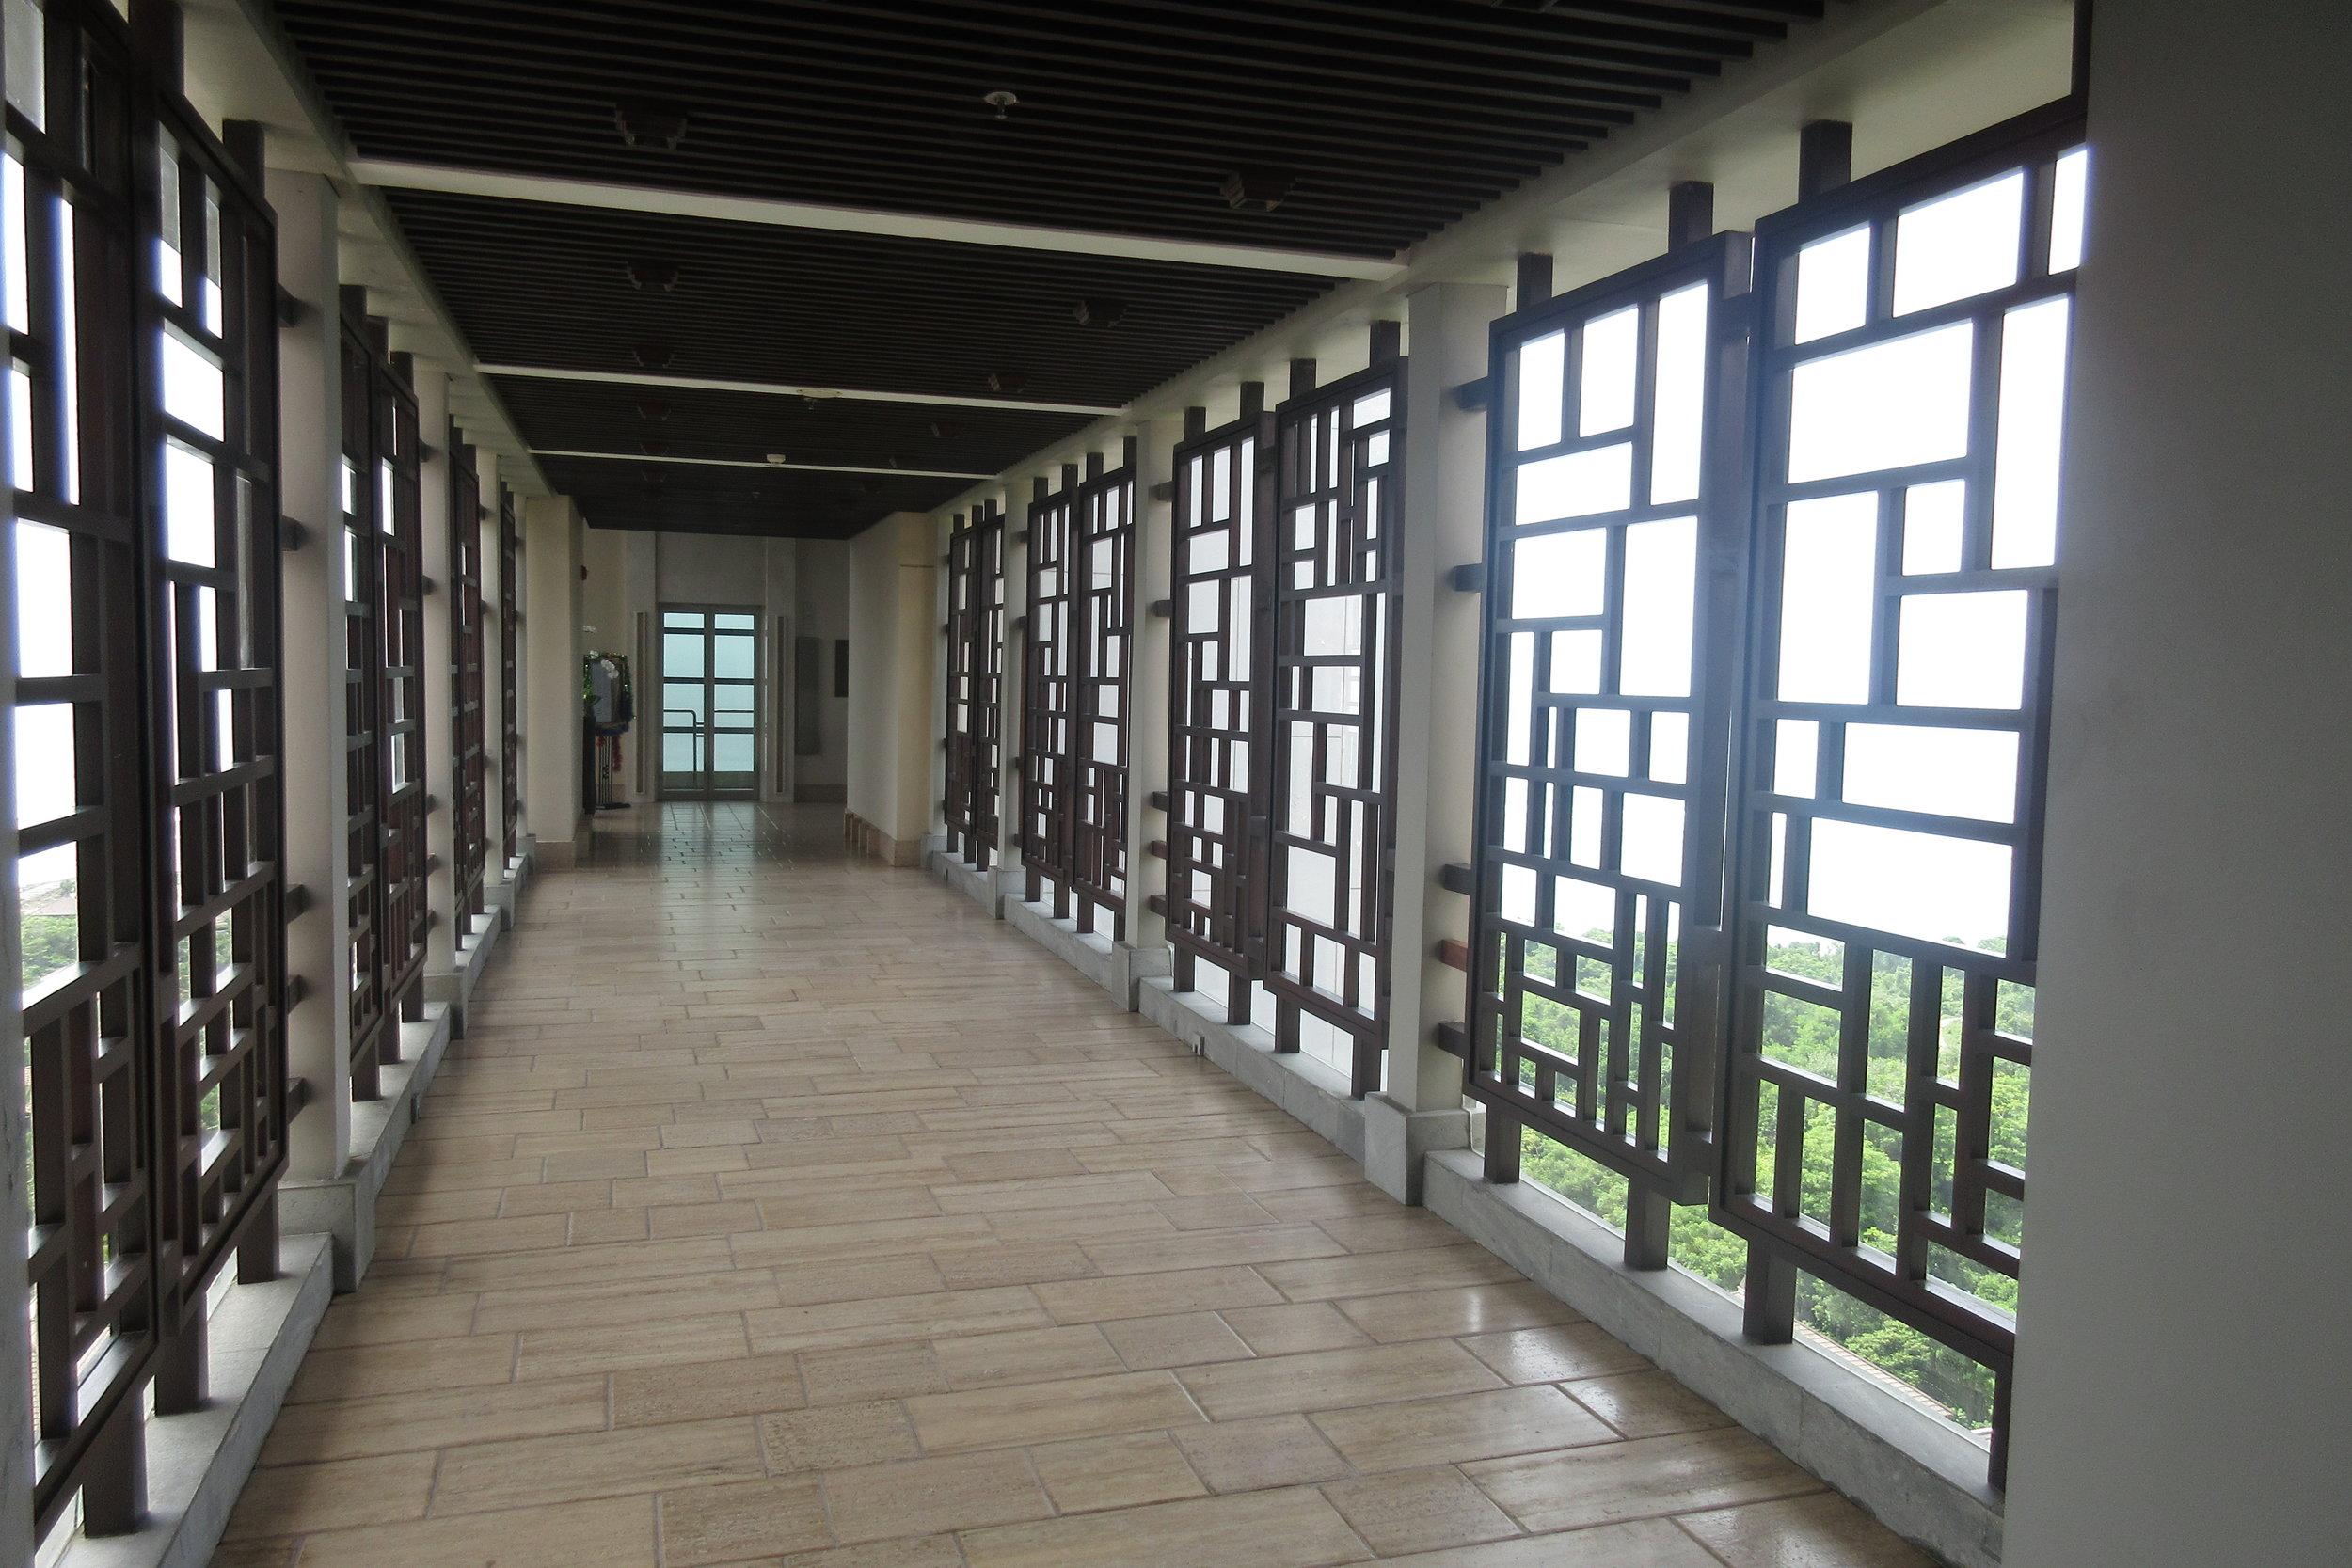 The Ritz-Carlton, Bali – Hallway to elevators